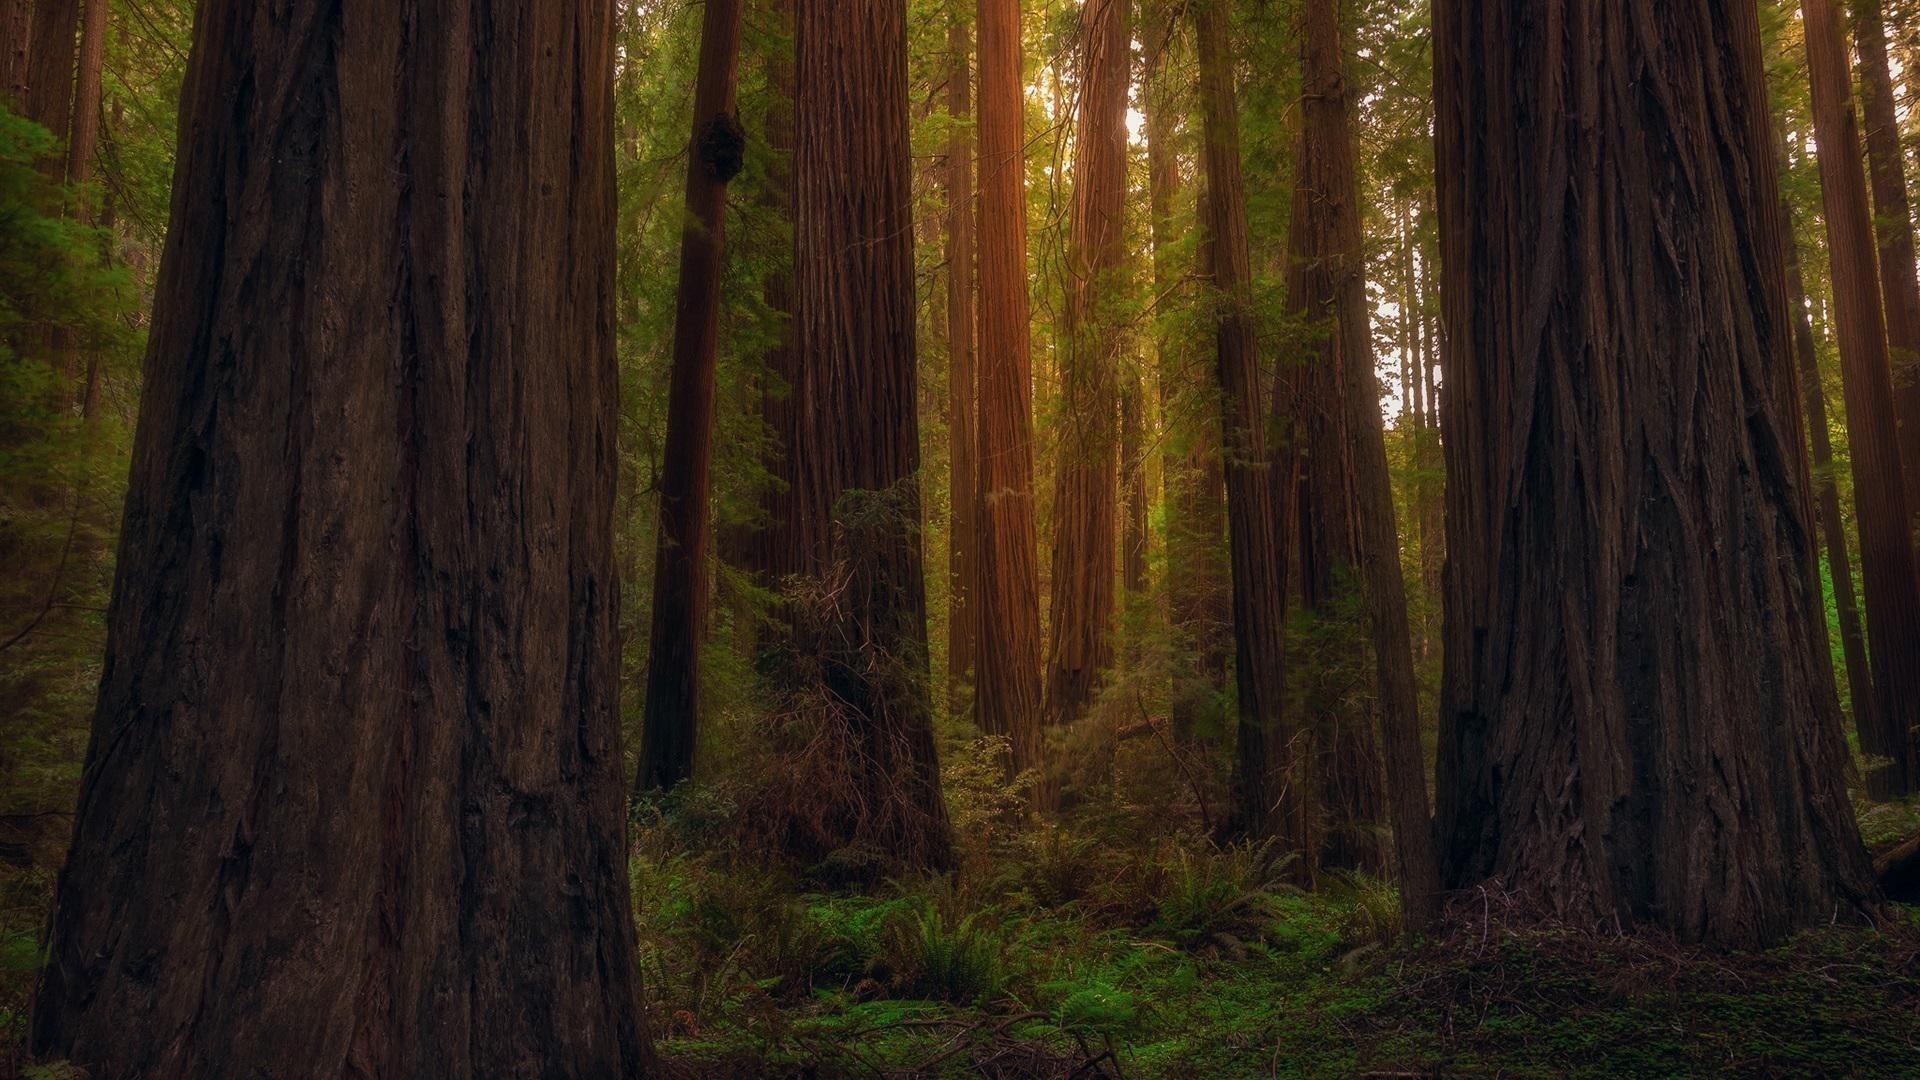 Redwood Trees windows background